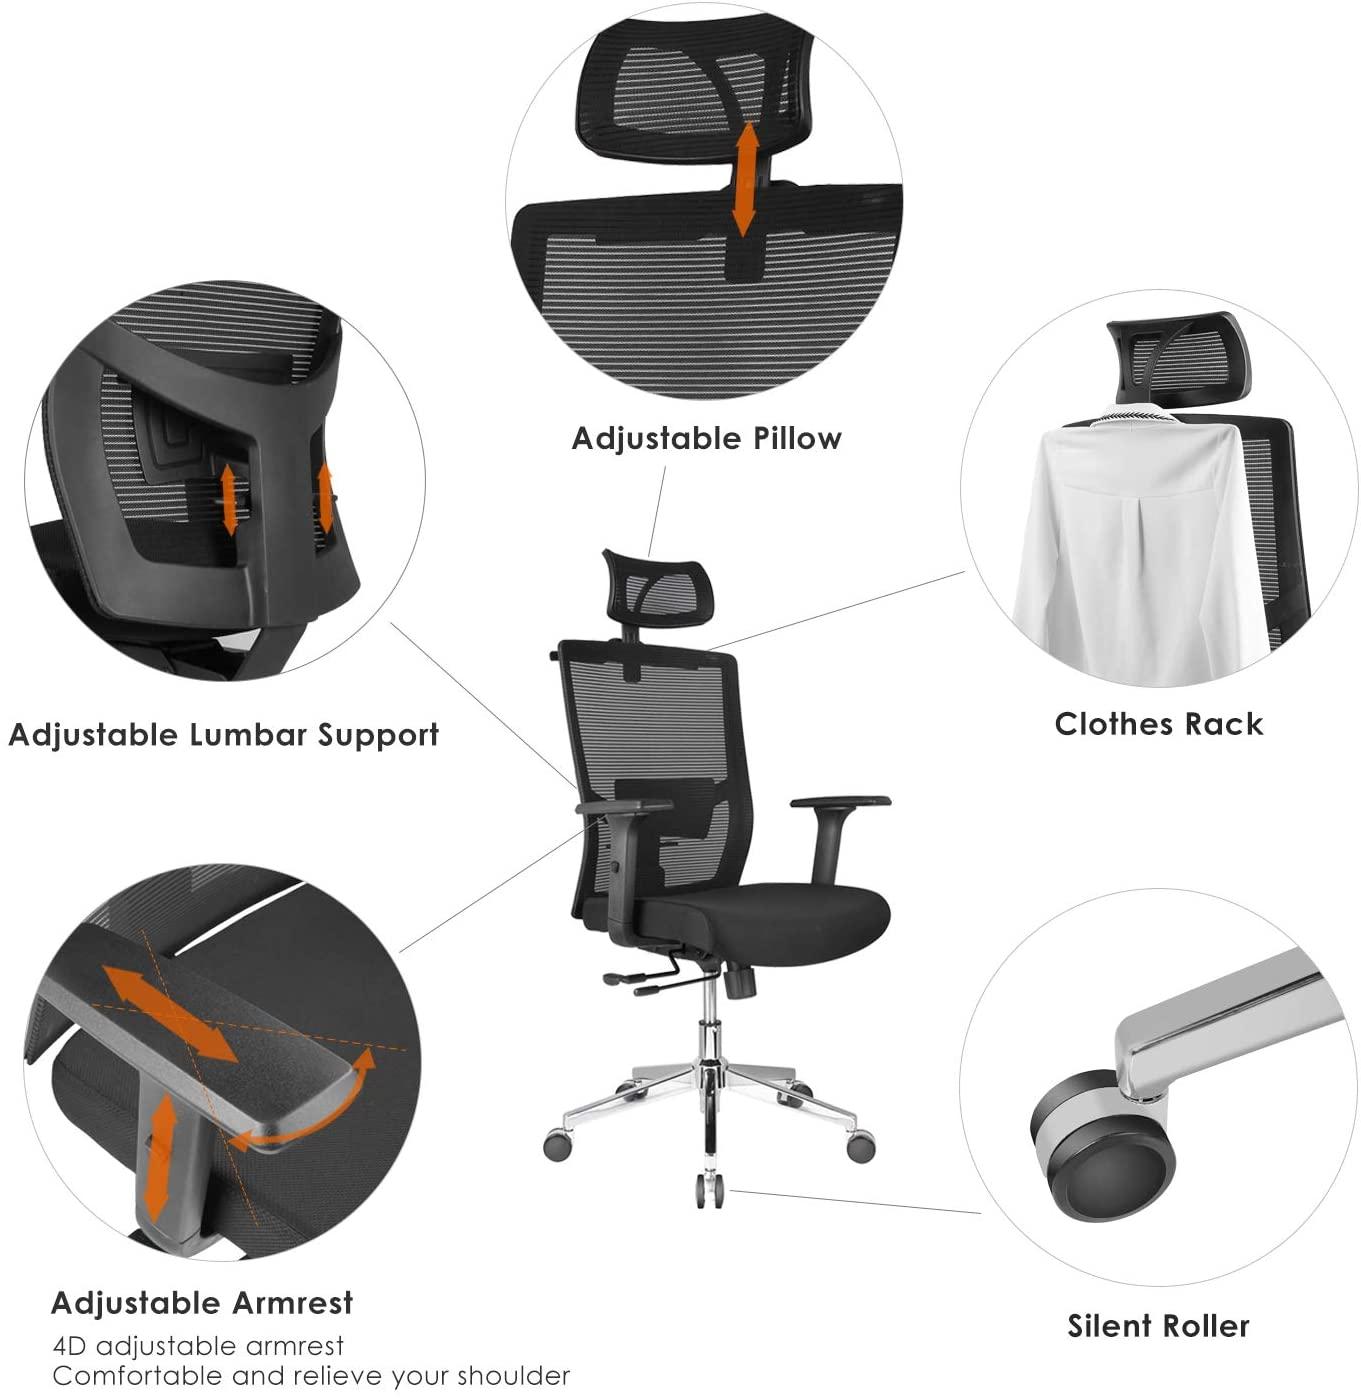 silla-ergonomica-de-oficina-fixkit.jpg